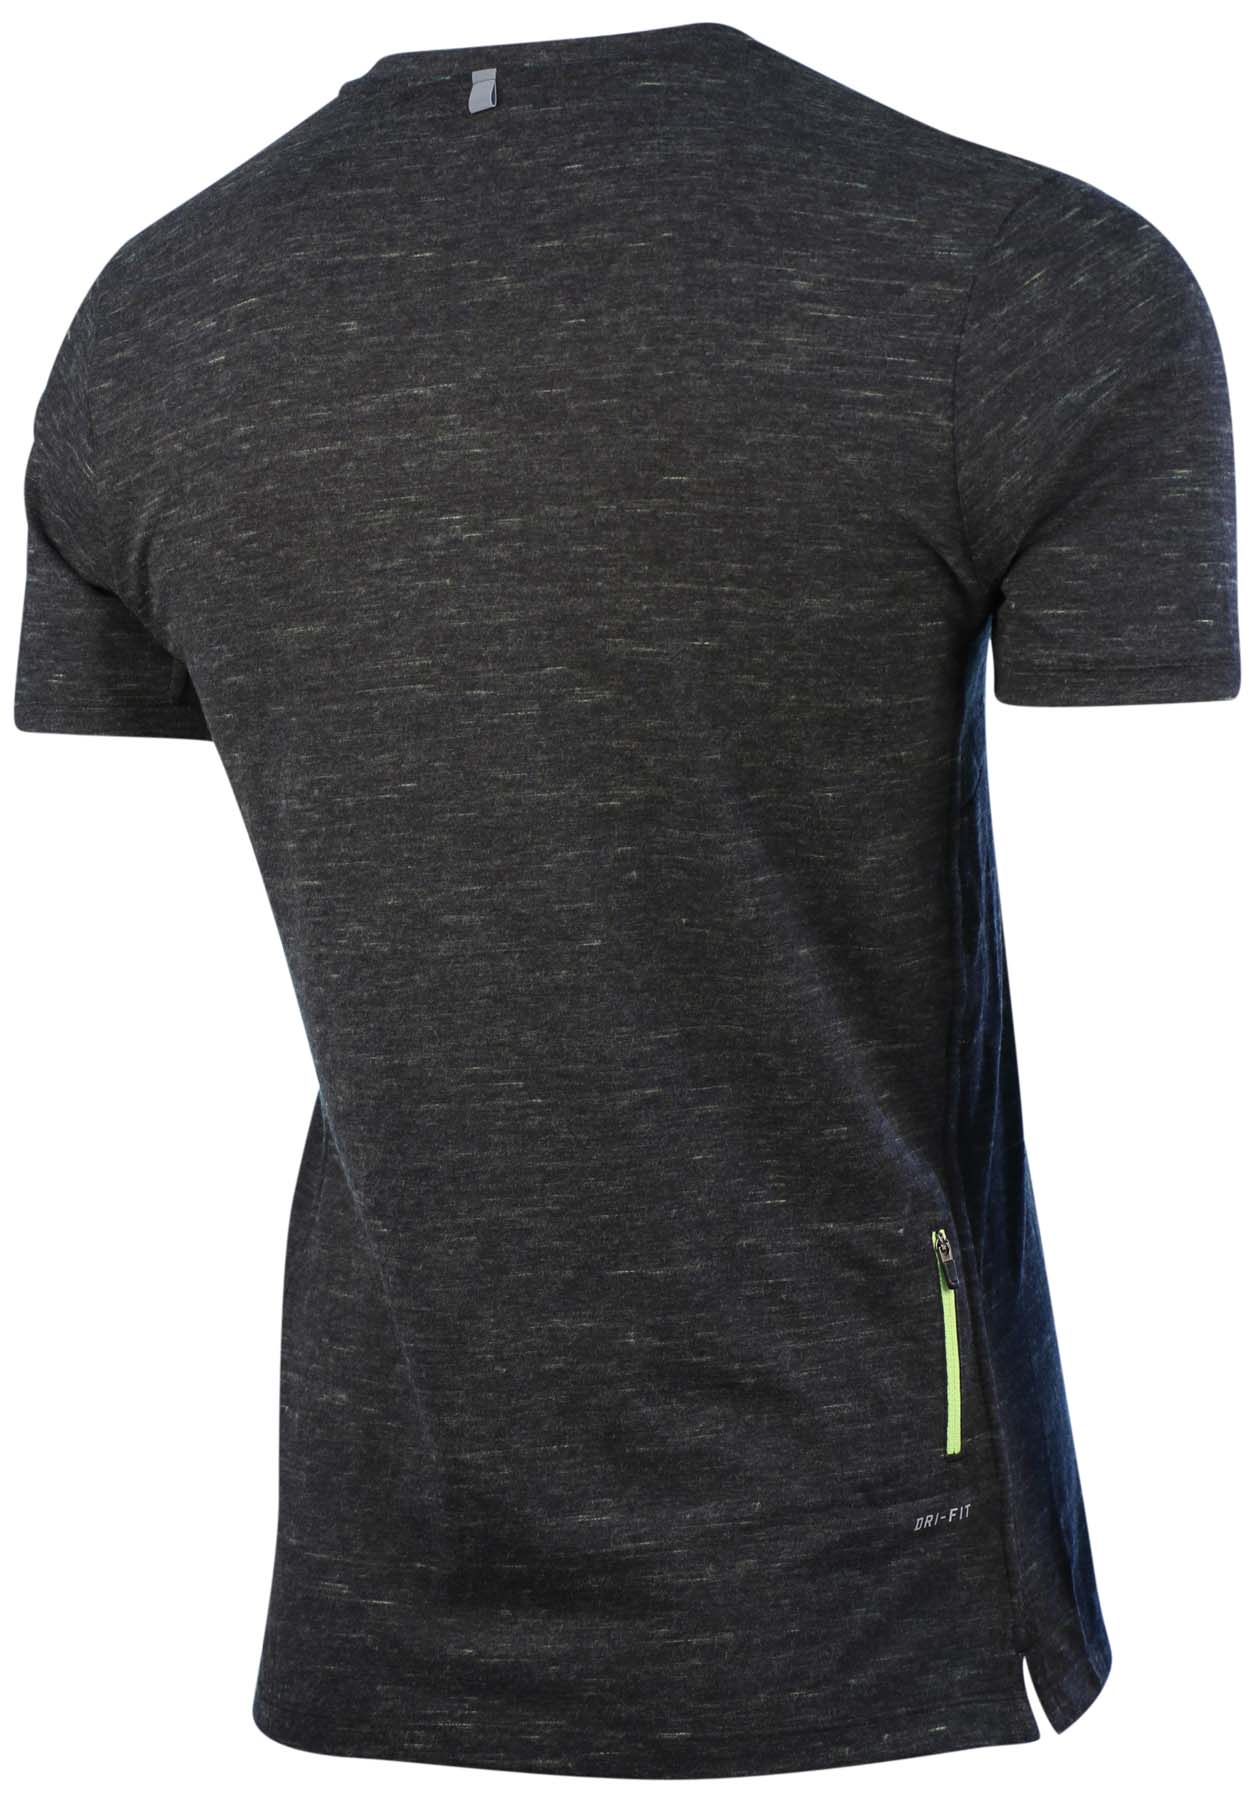 Nike men 39 s dri fit neon v neck running t shirt ebay for Dri fit t shirts nike